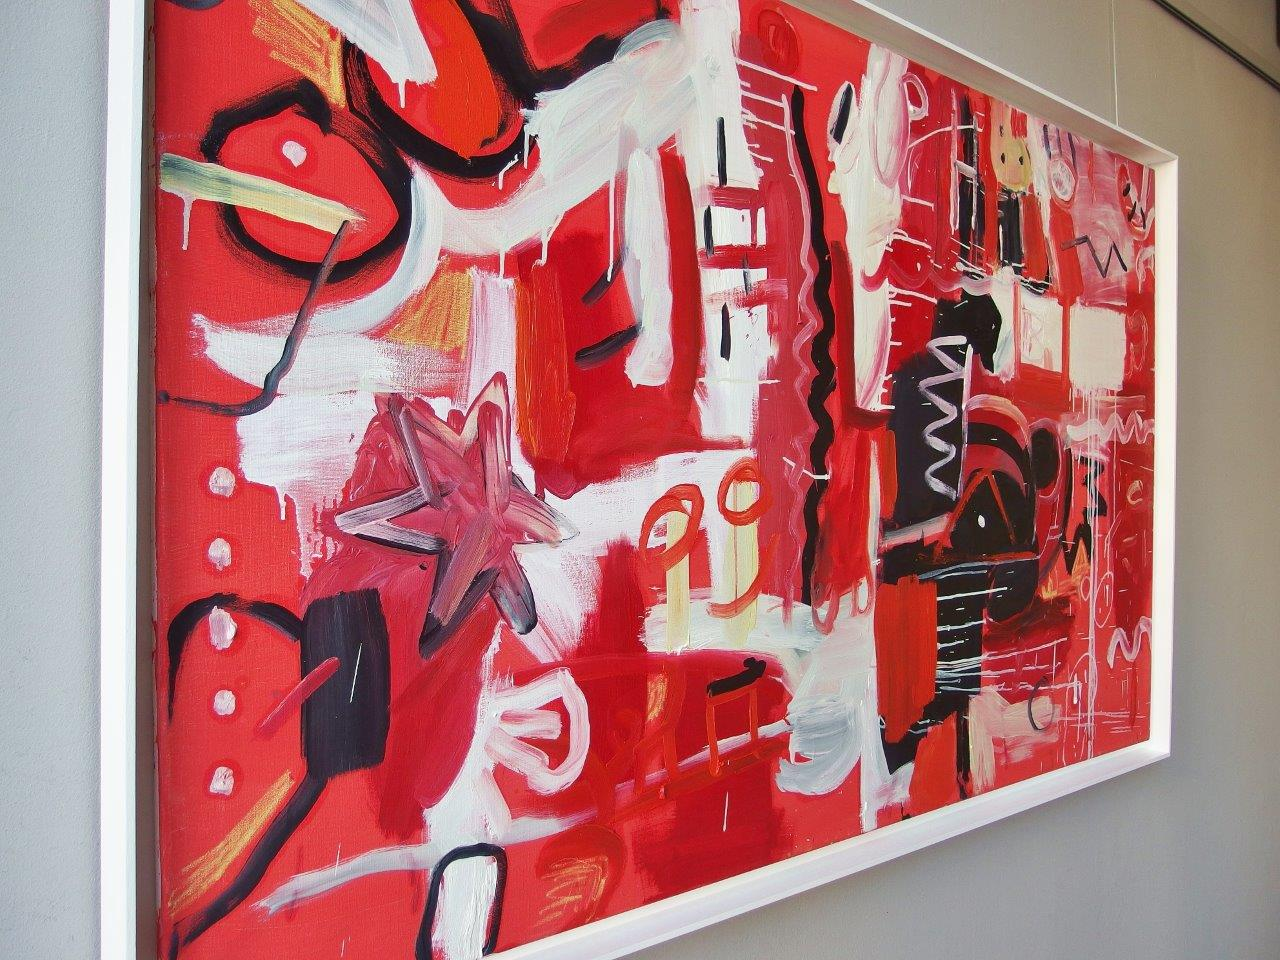 Kalina Horoń - Event on the wall